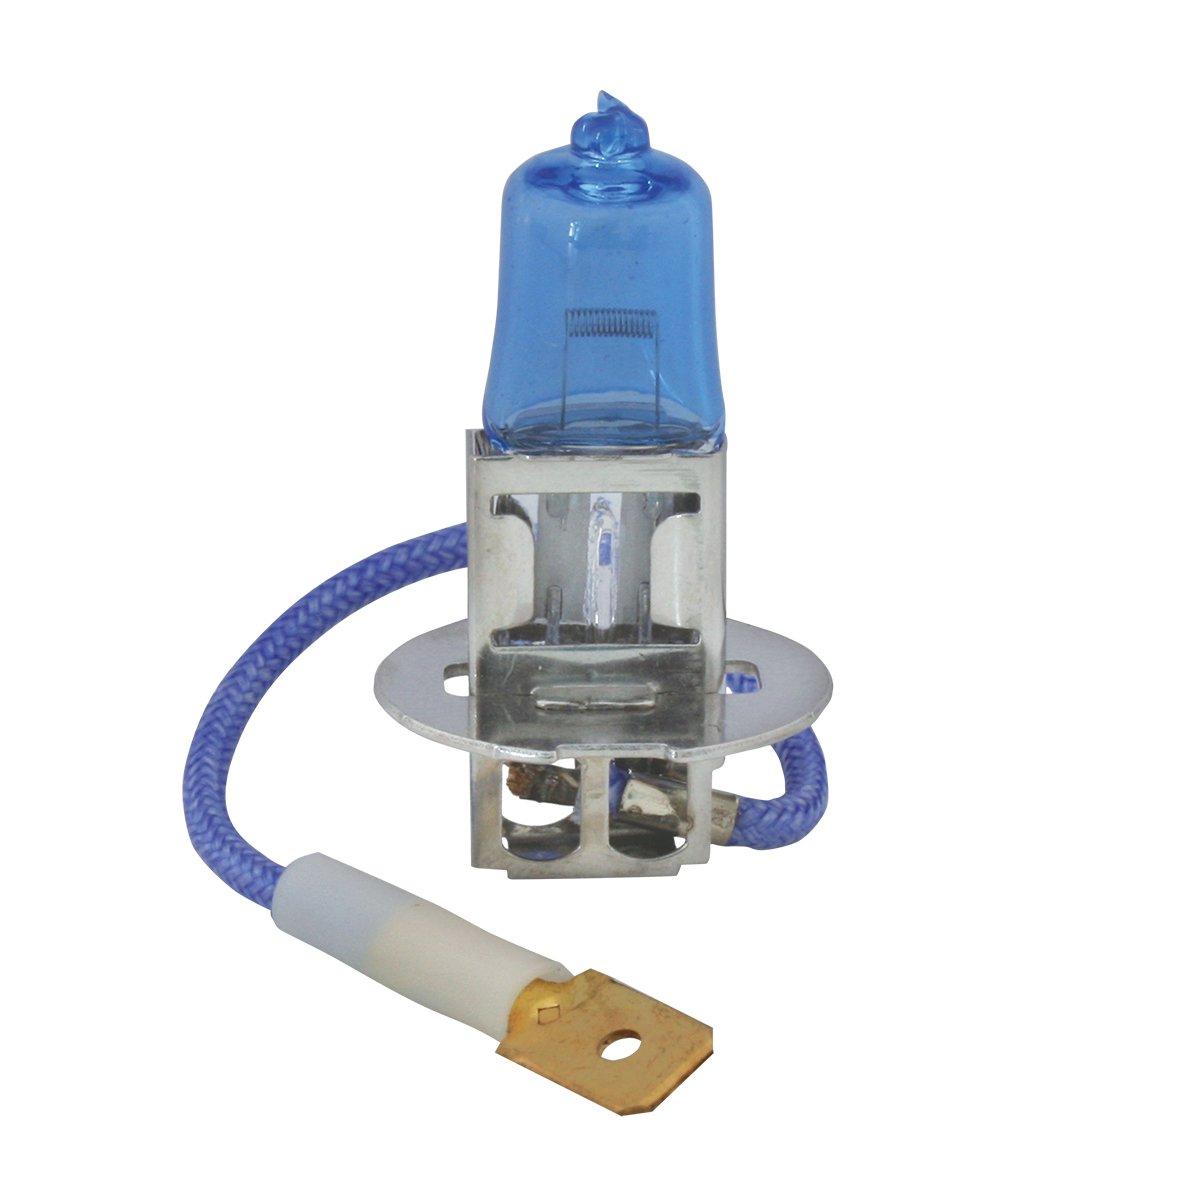 Grand General 82111 H3 Icy Blue Headlight Halogen Bulbs Twin Pack, 12V/55W